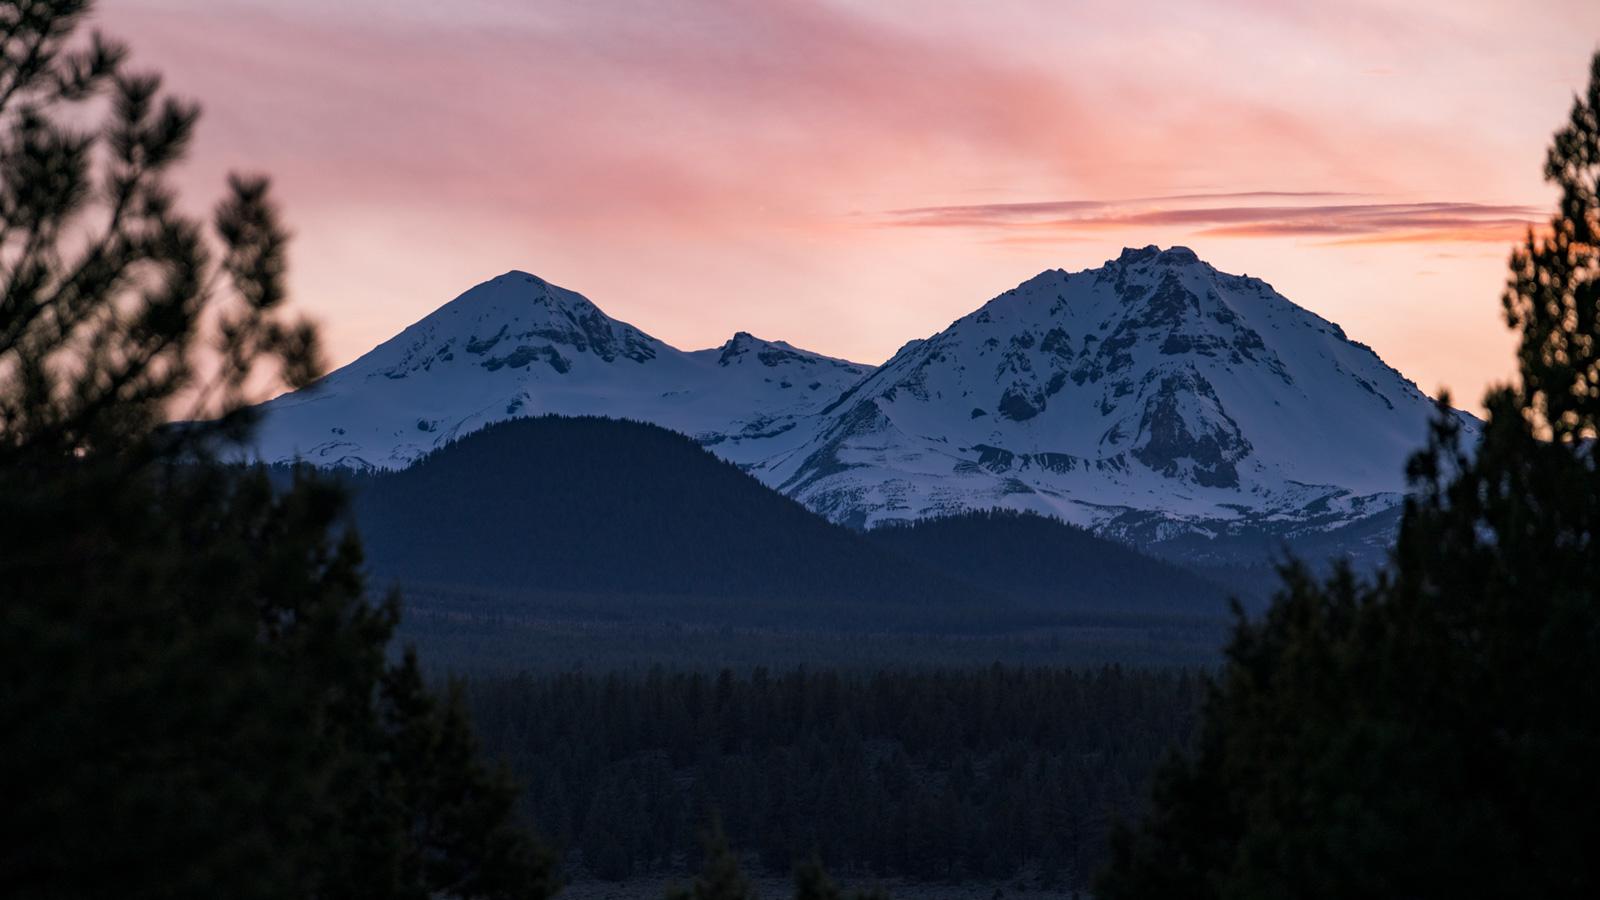 Mountain view outside of Bend, Oregon.